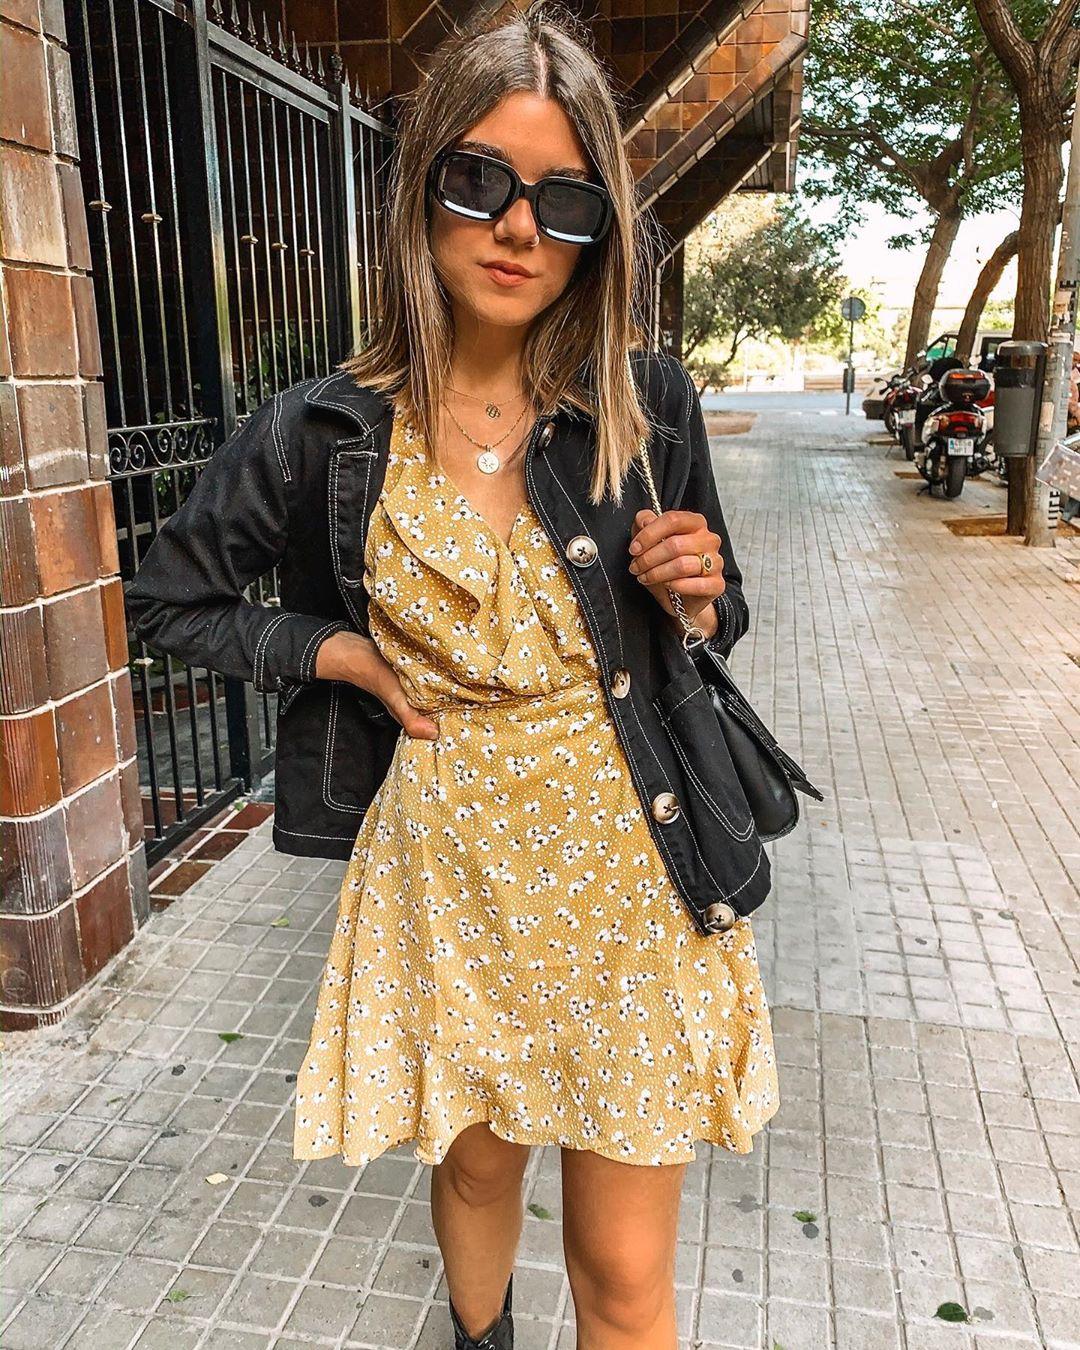 floral print mini dress de Zara sur amparocamo